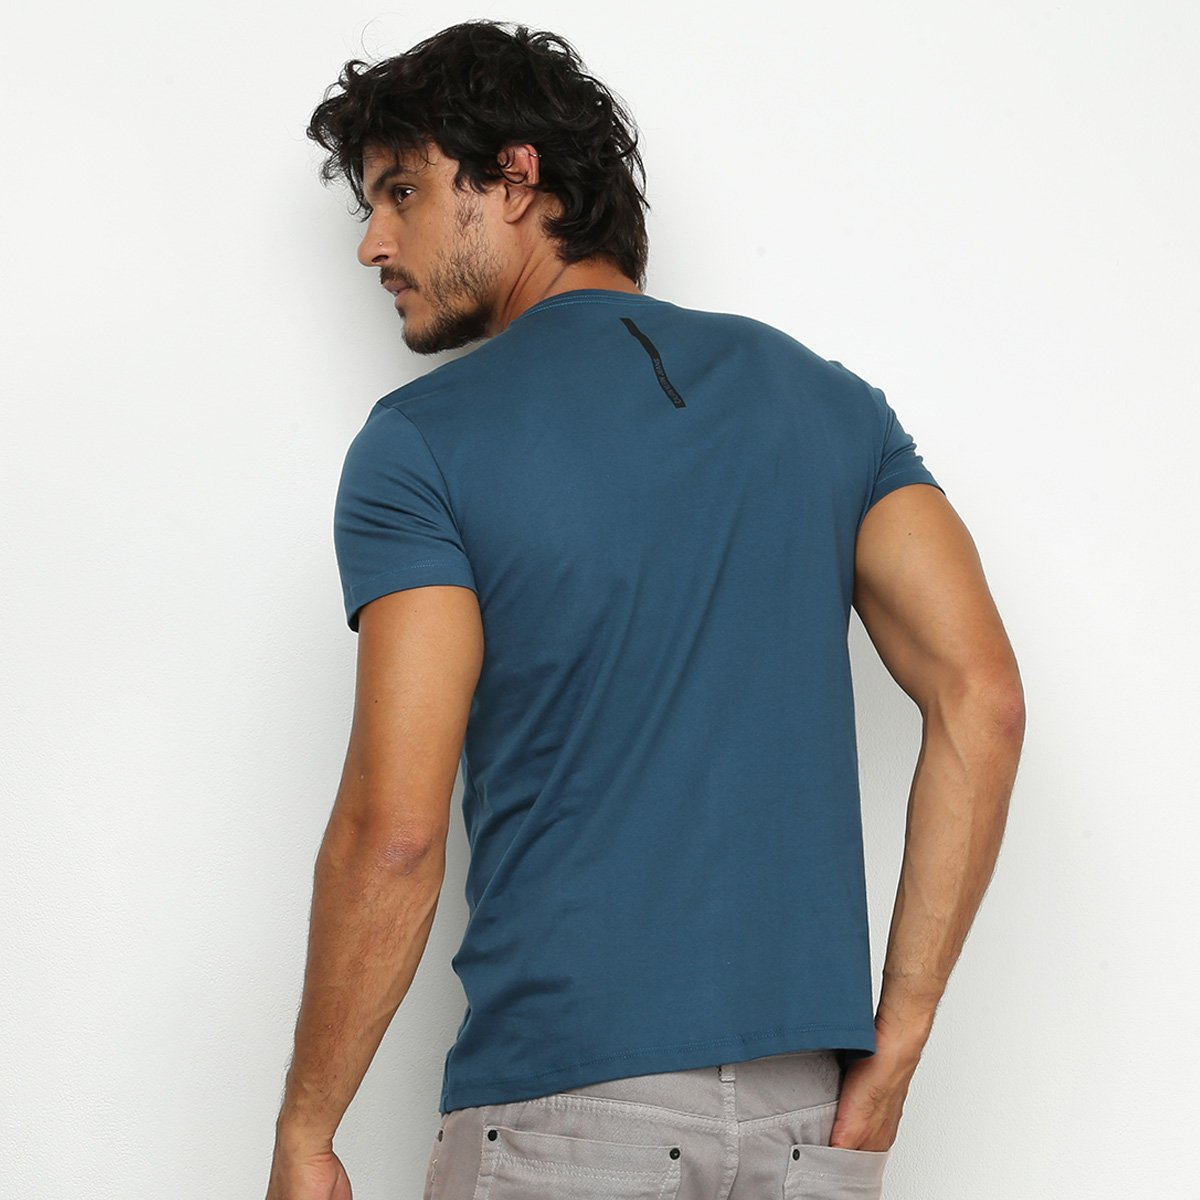 Camiseta Calvin Klein Re Issue Retangulo Masculina - Azul Escuro